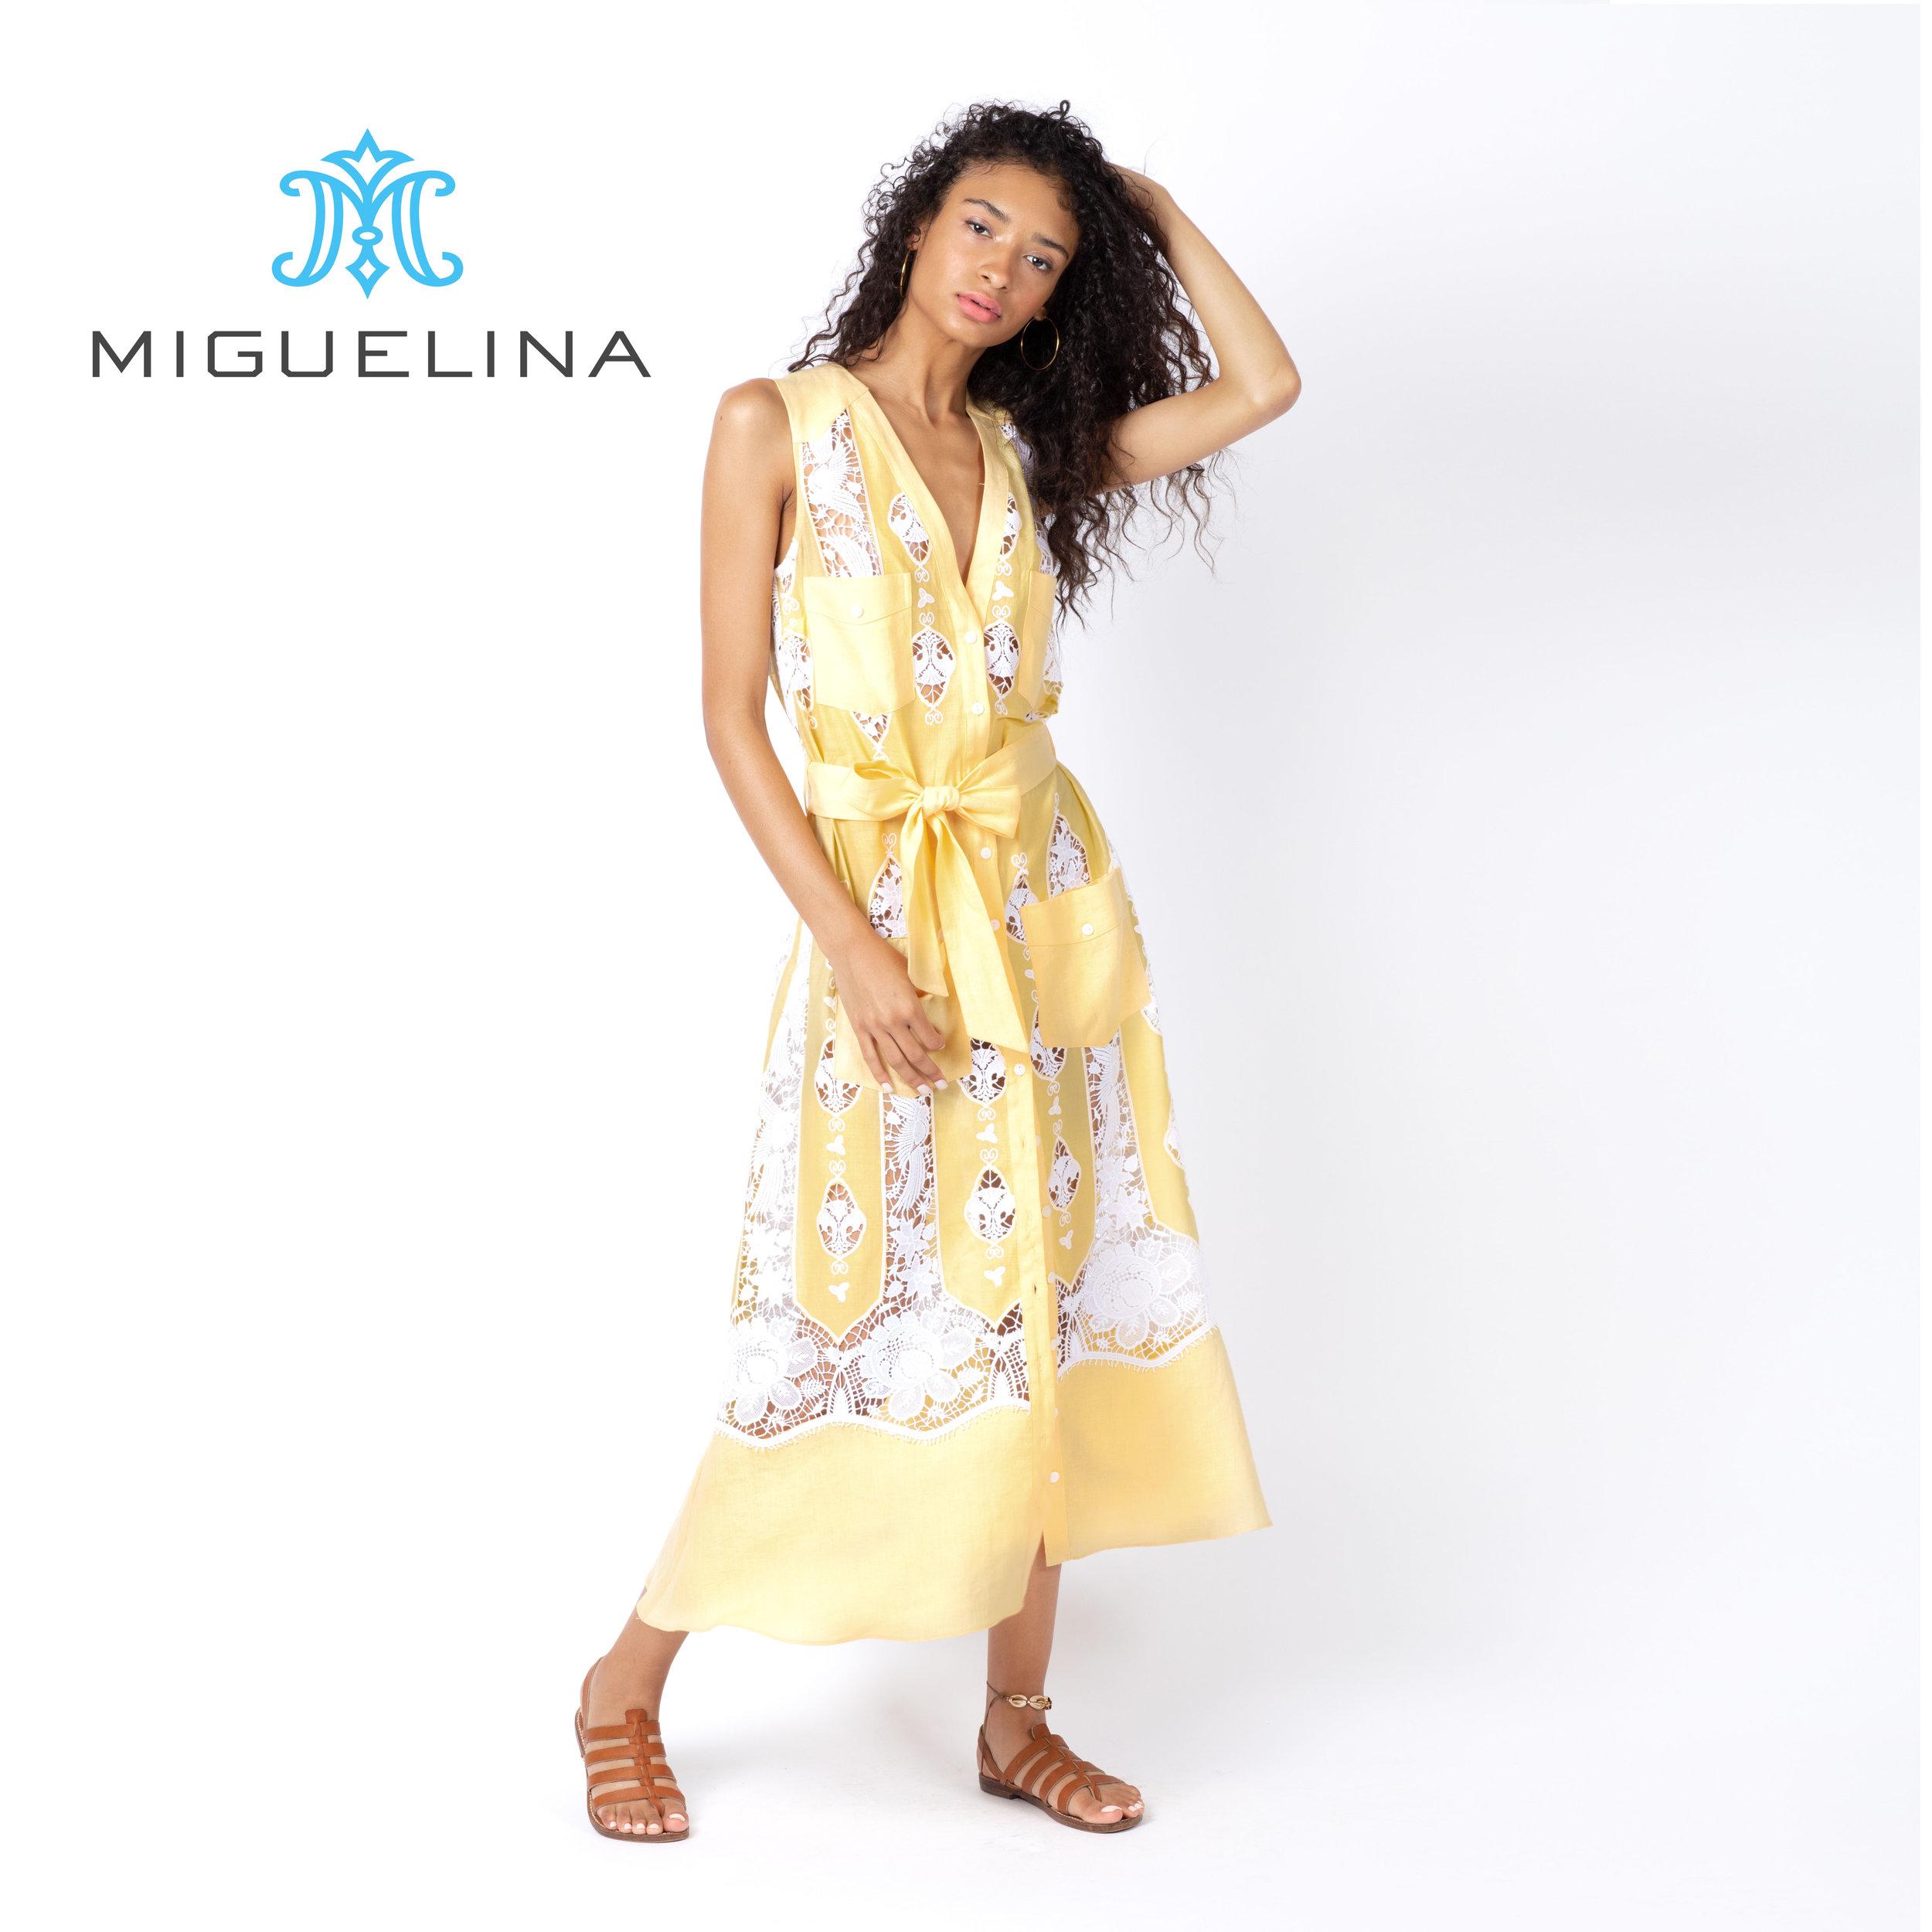 UE_Miguelina.jpg